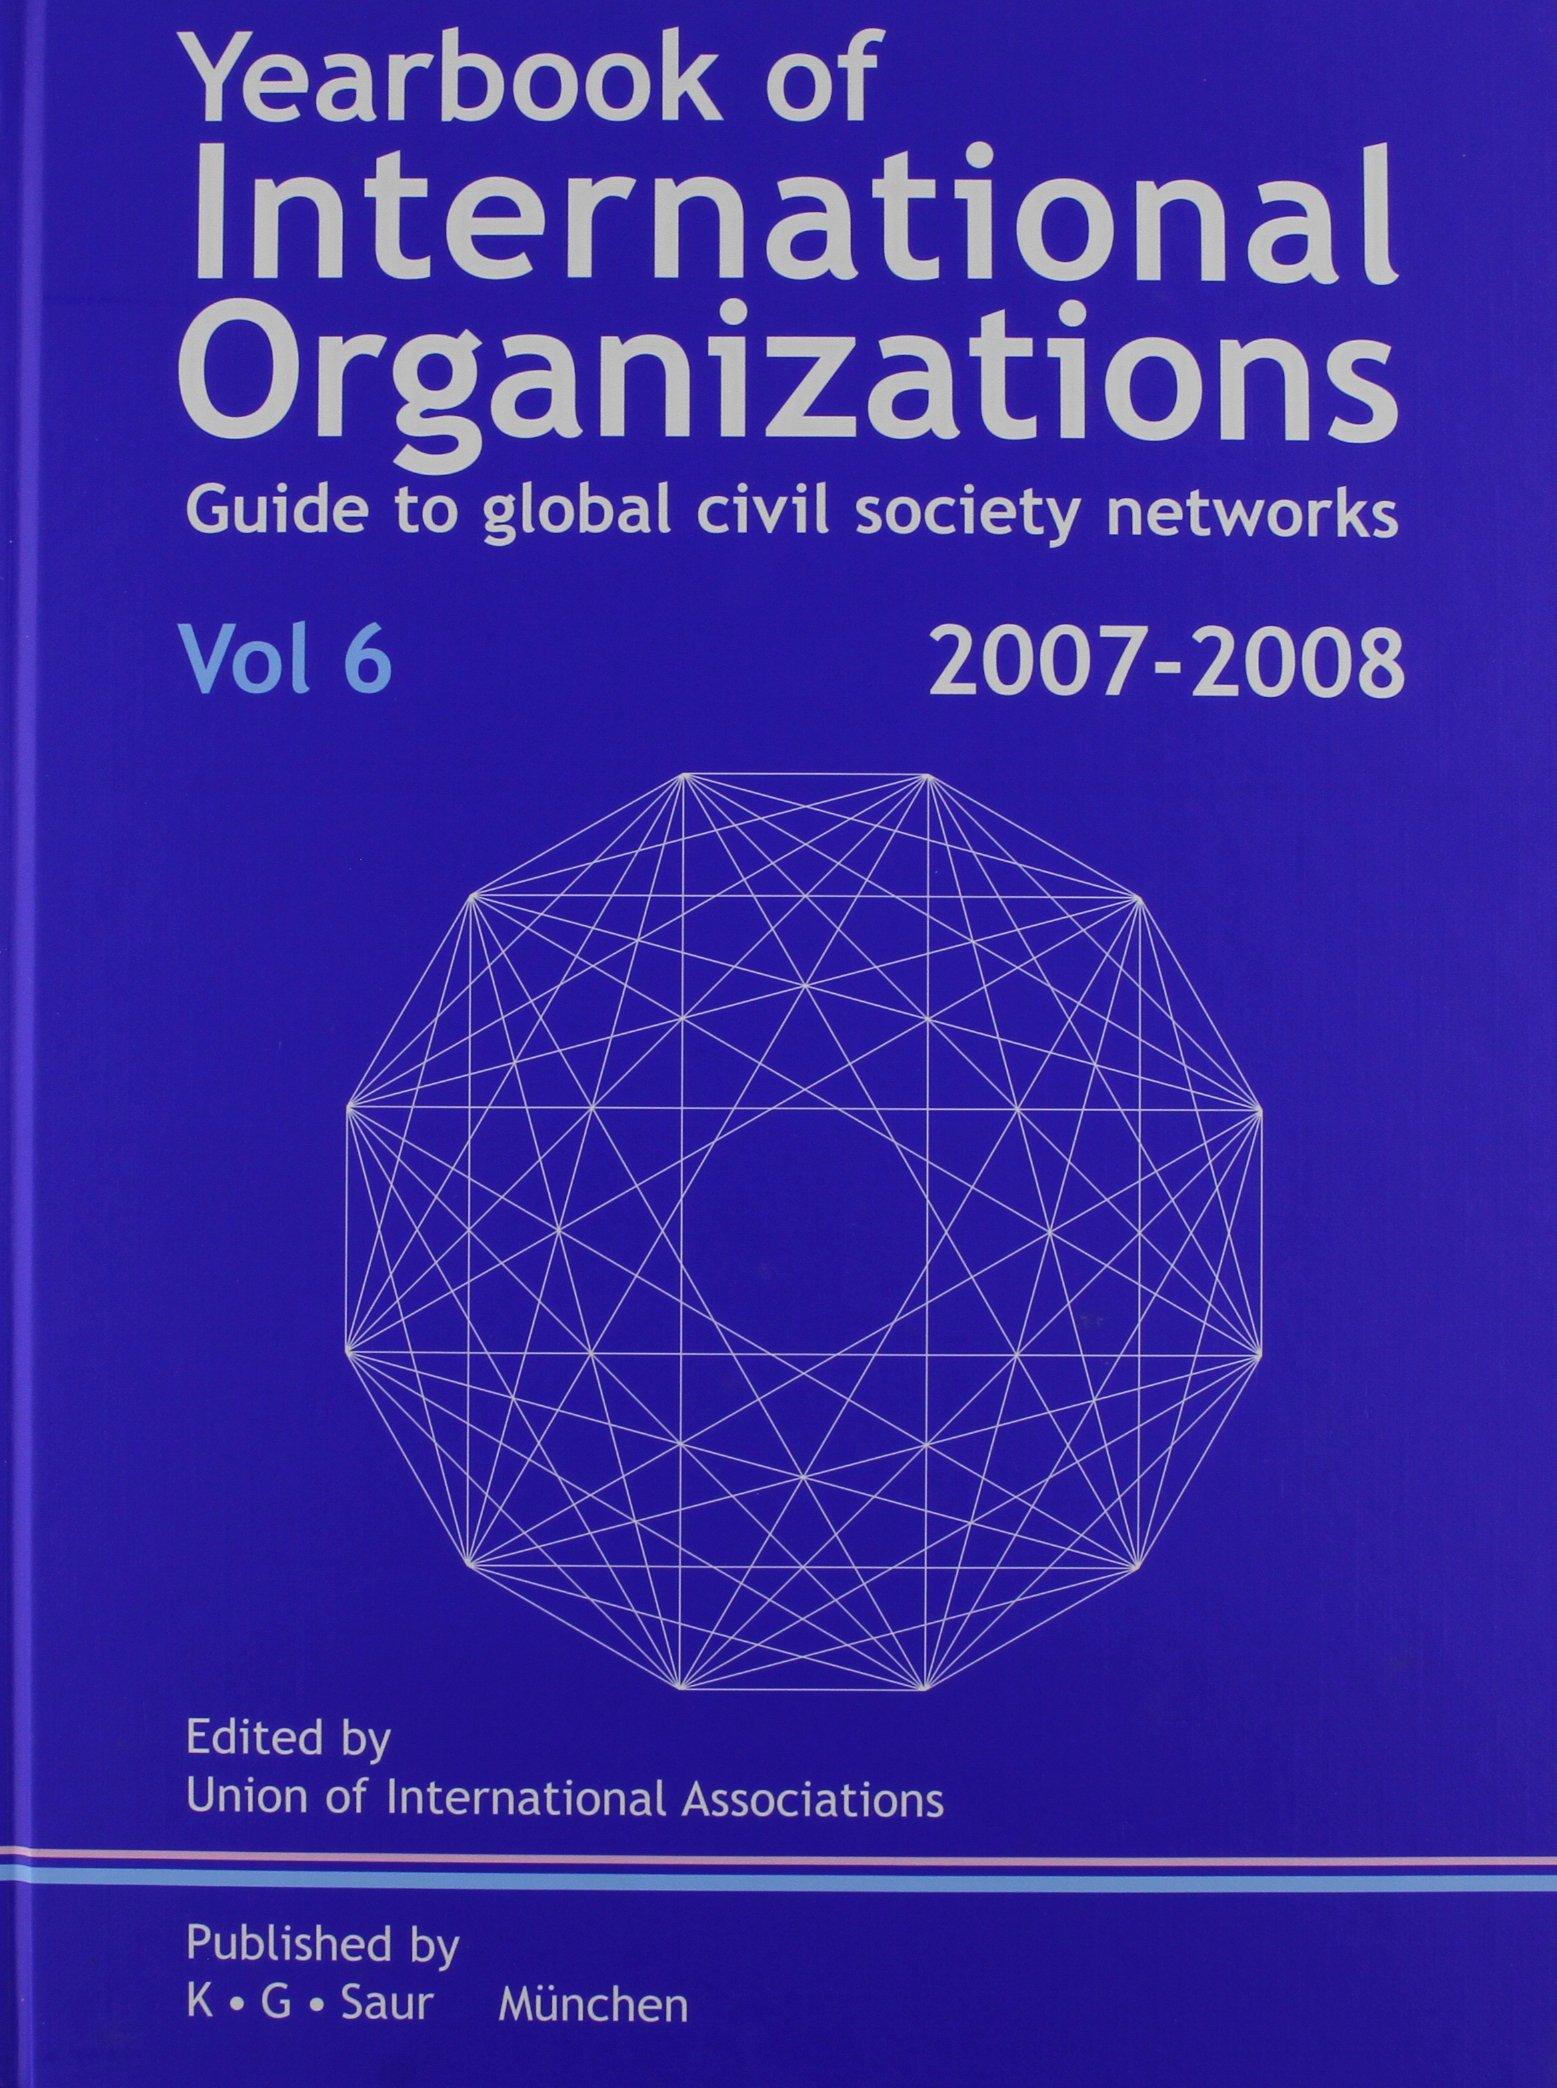 Yearbook of International Organizations 2007/2009: Volume 6:  Who's Who in International Organizations (Yearbook of International Organizations. Volume 6: Who's Who in International Organizations) PDF